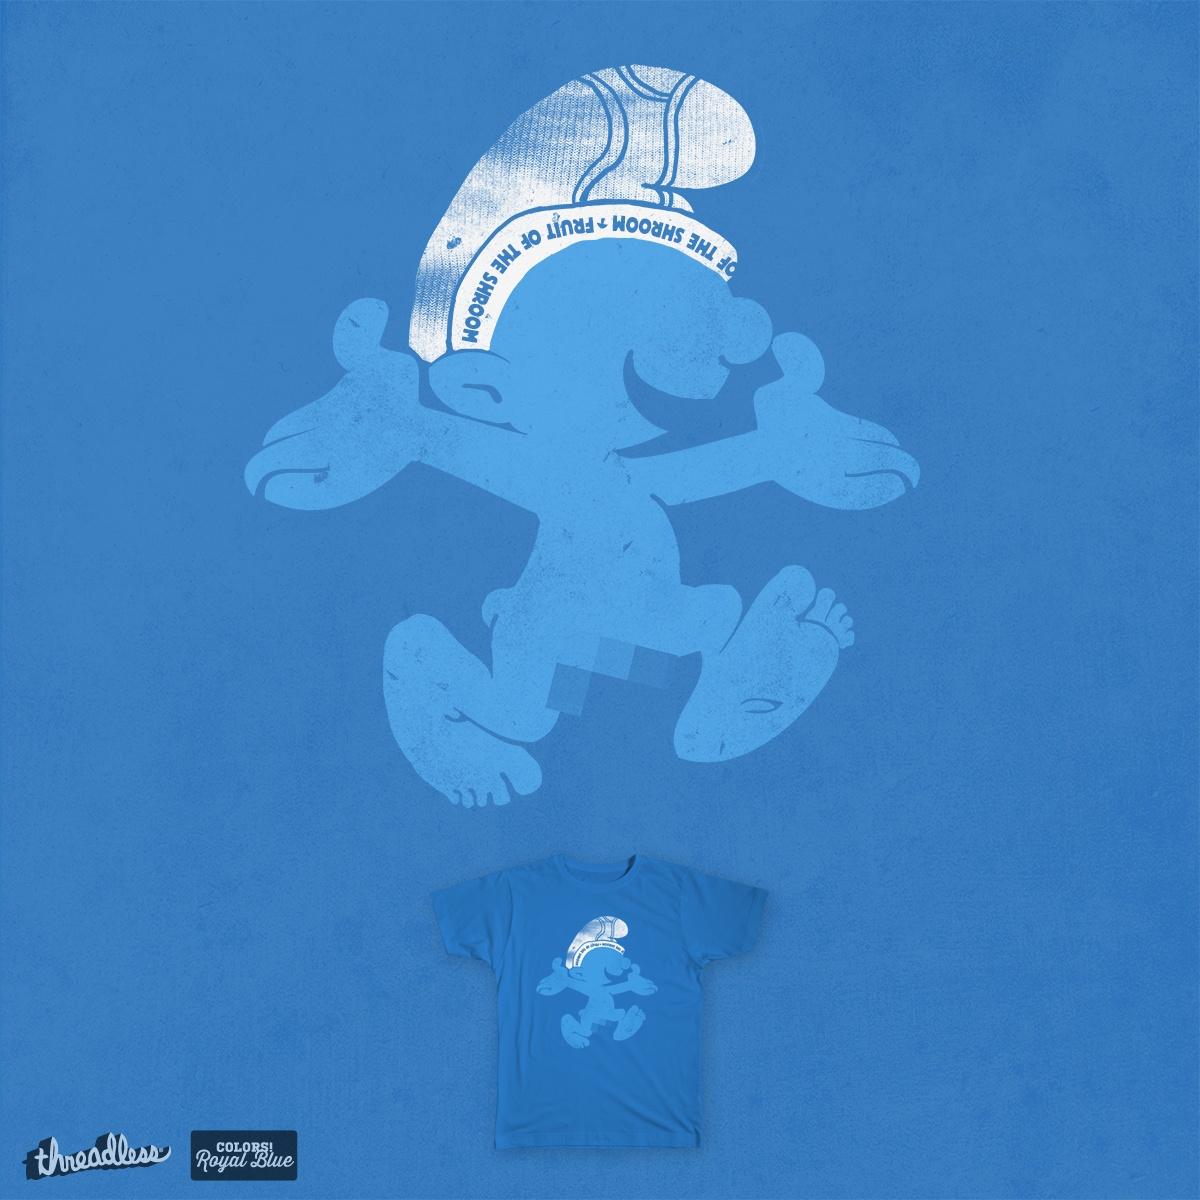 krazy blue  by jerbing33 on Threadless